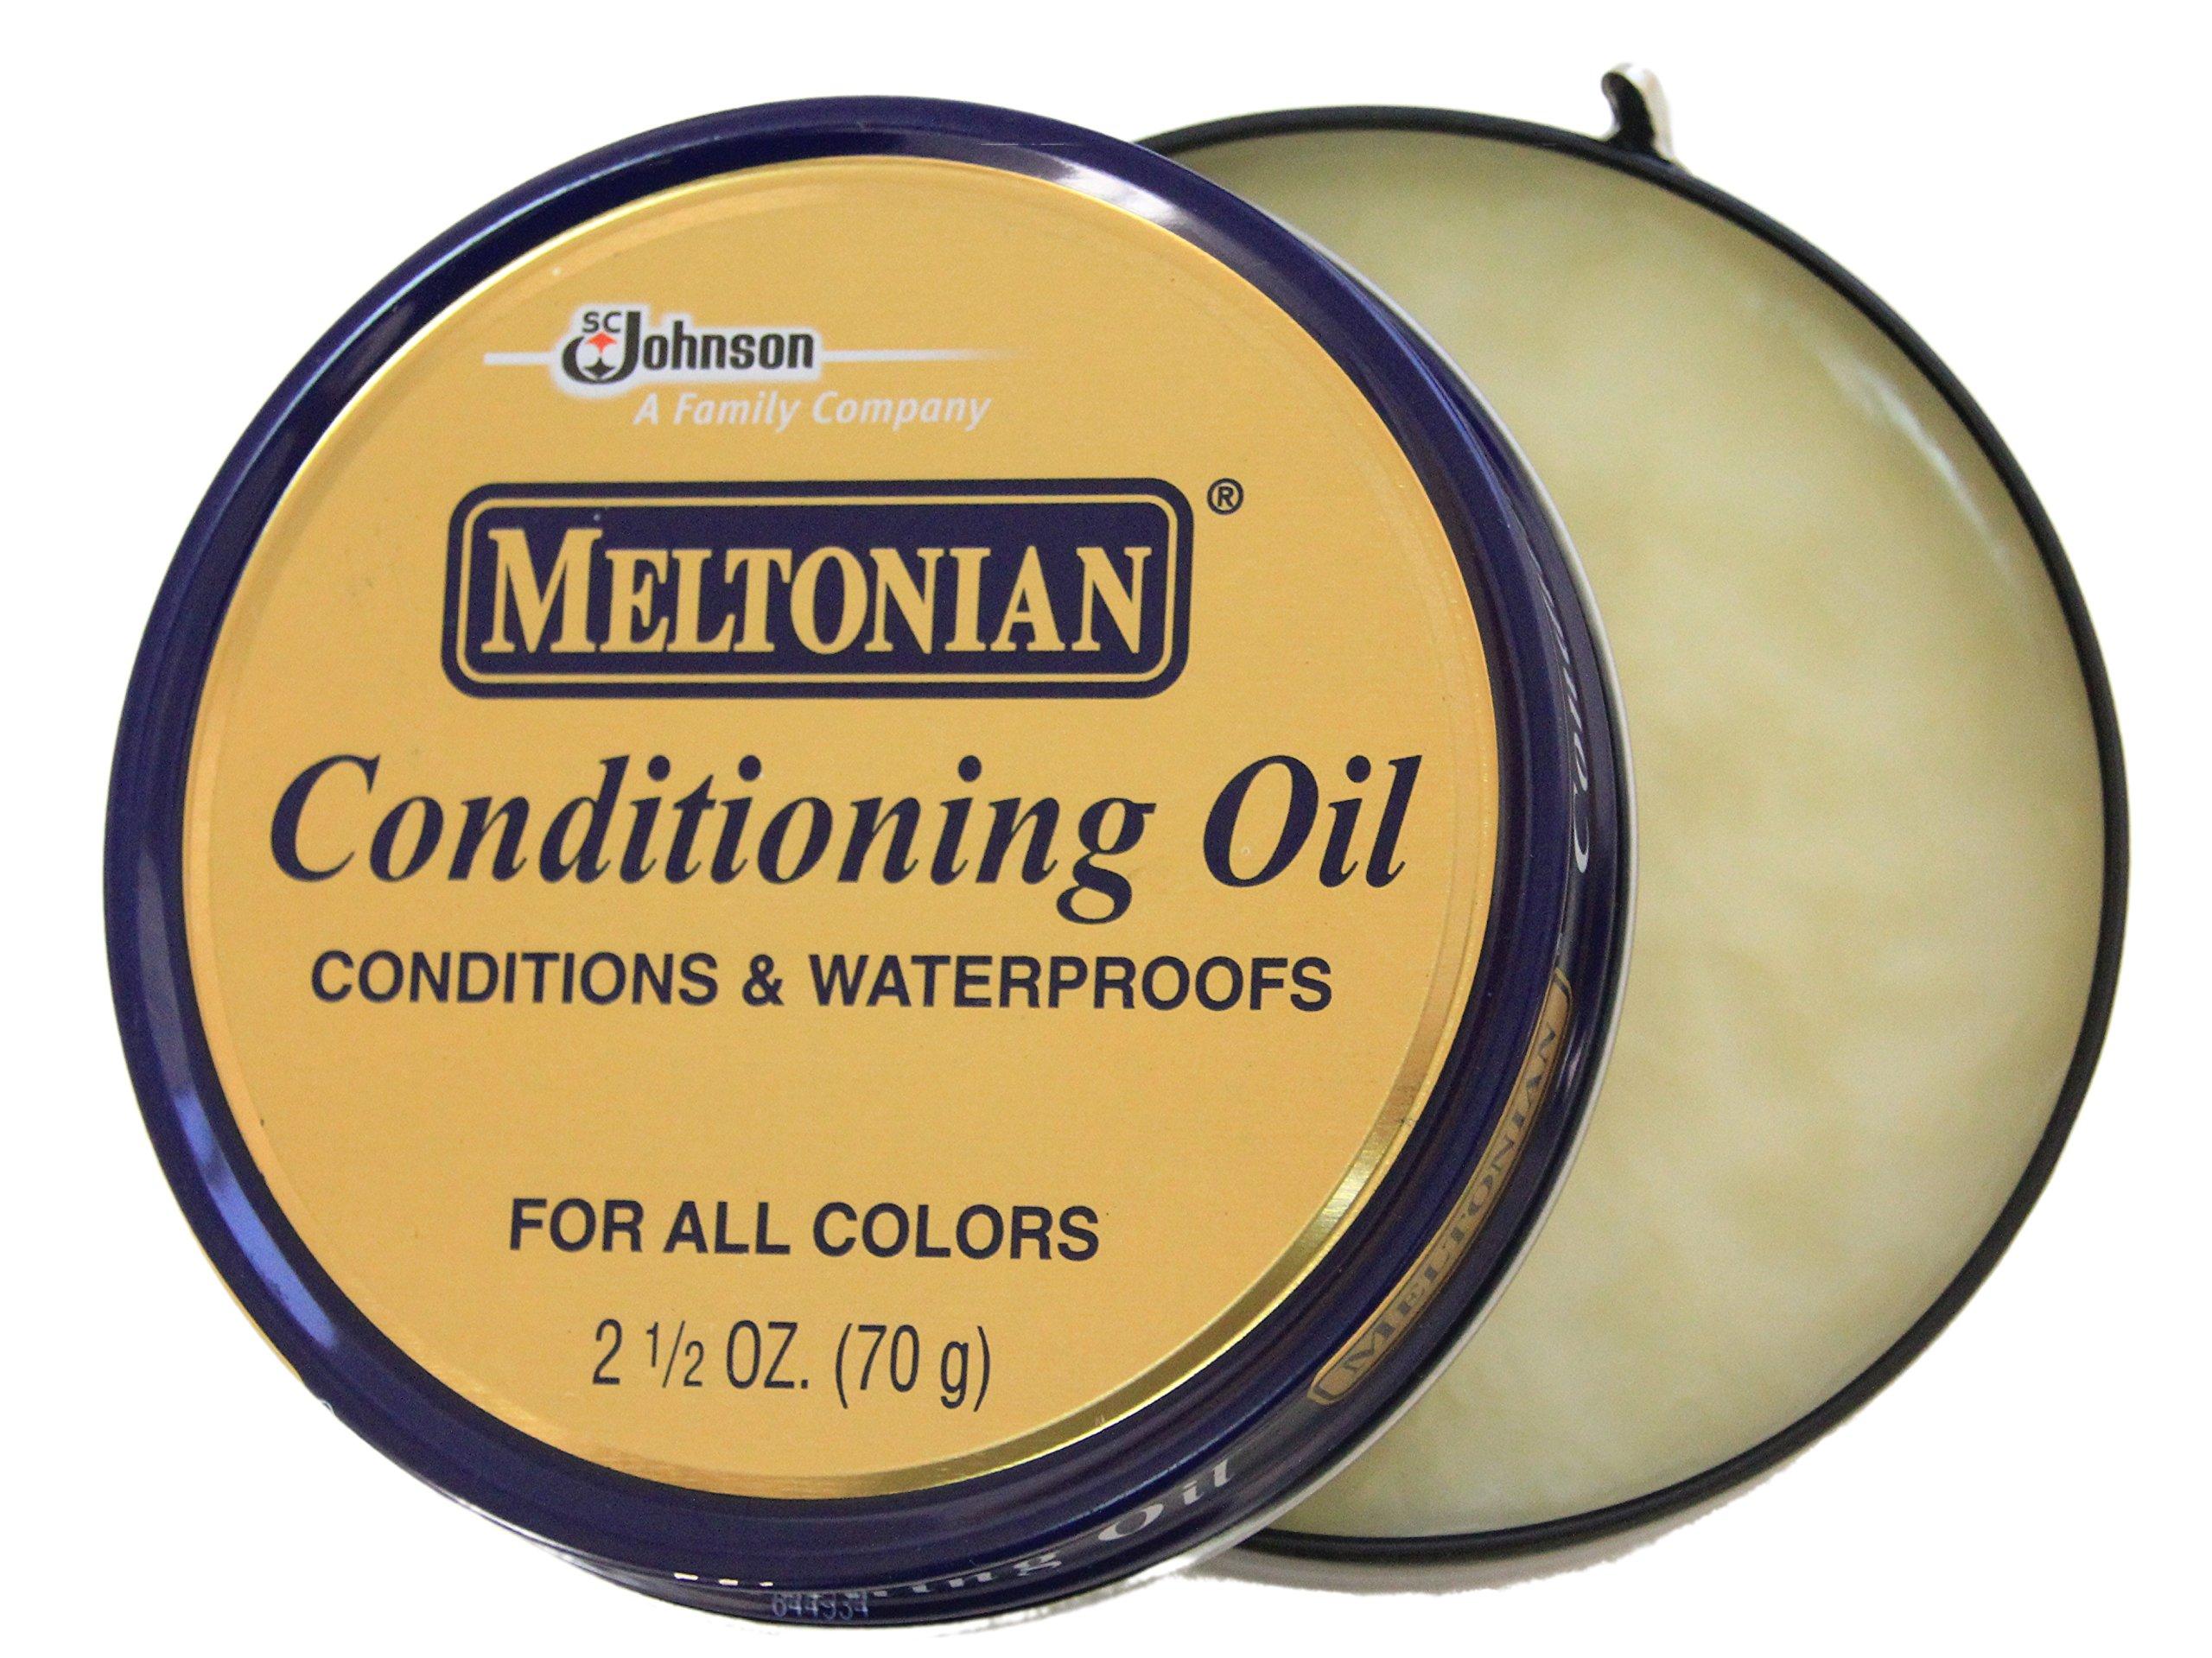 Meltonian Conditioning Oil, 2.5 Oz